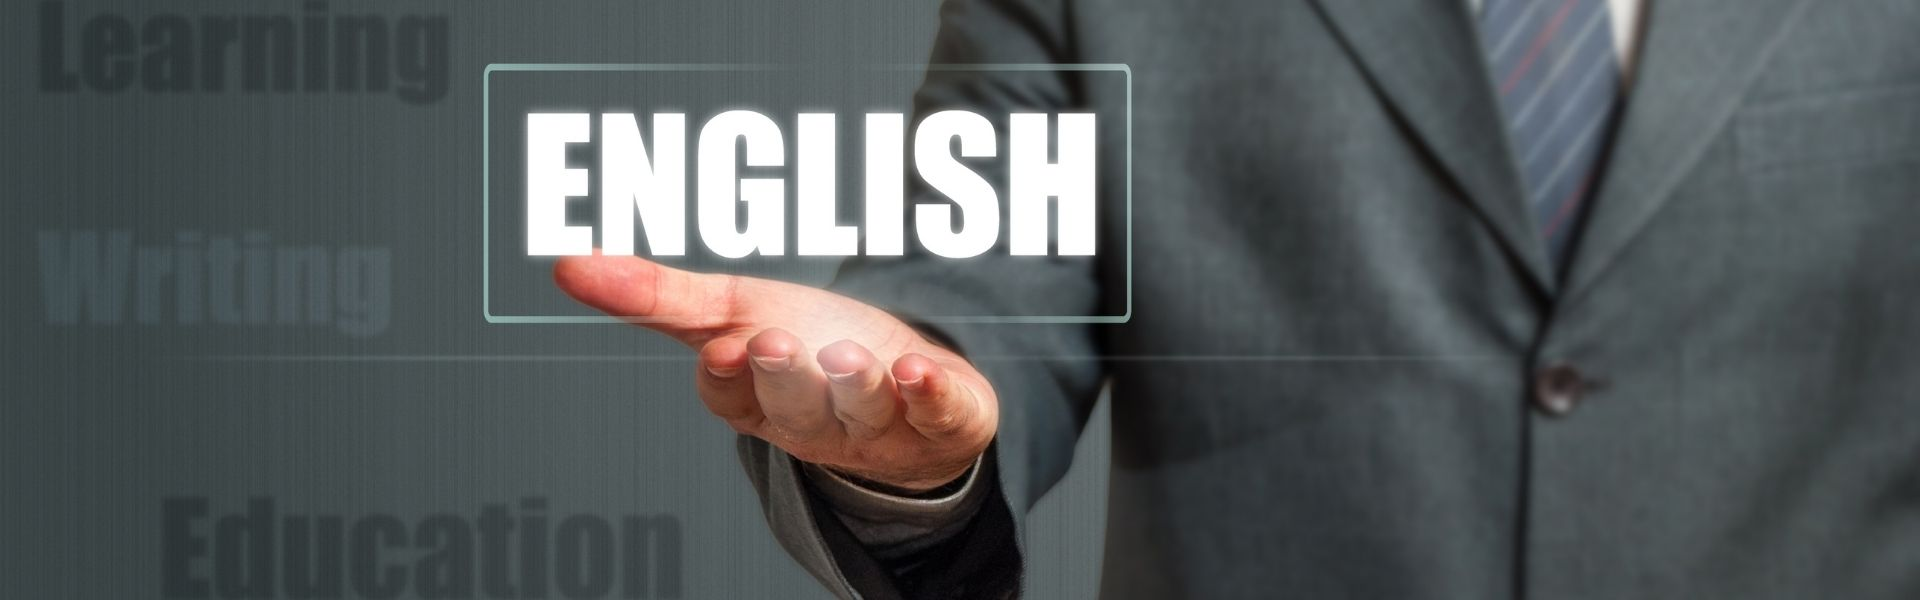 rutherford-English-exam-prep-centre-02